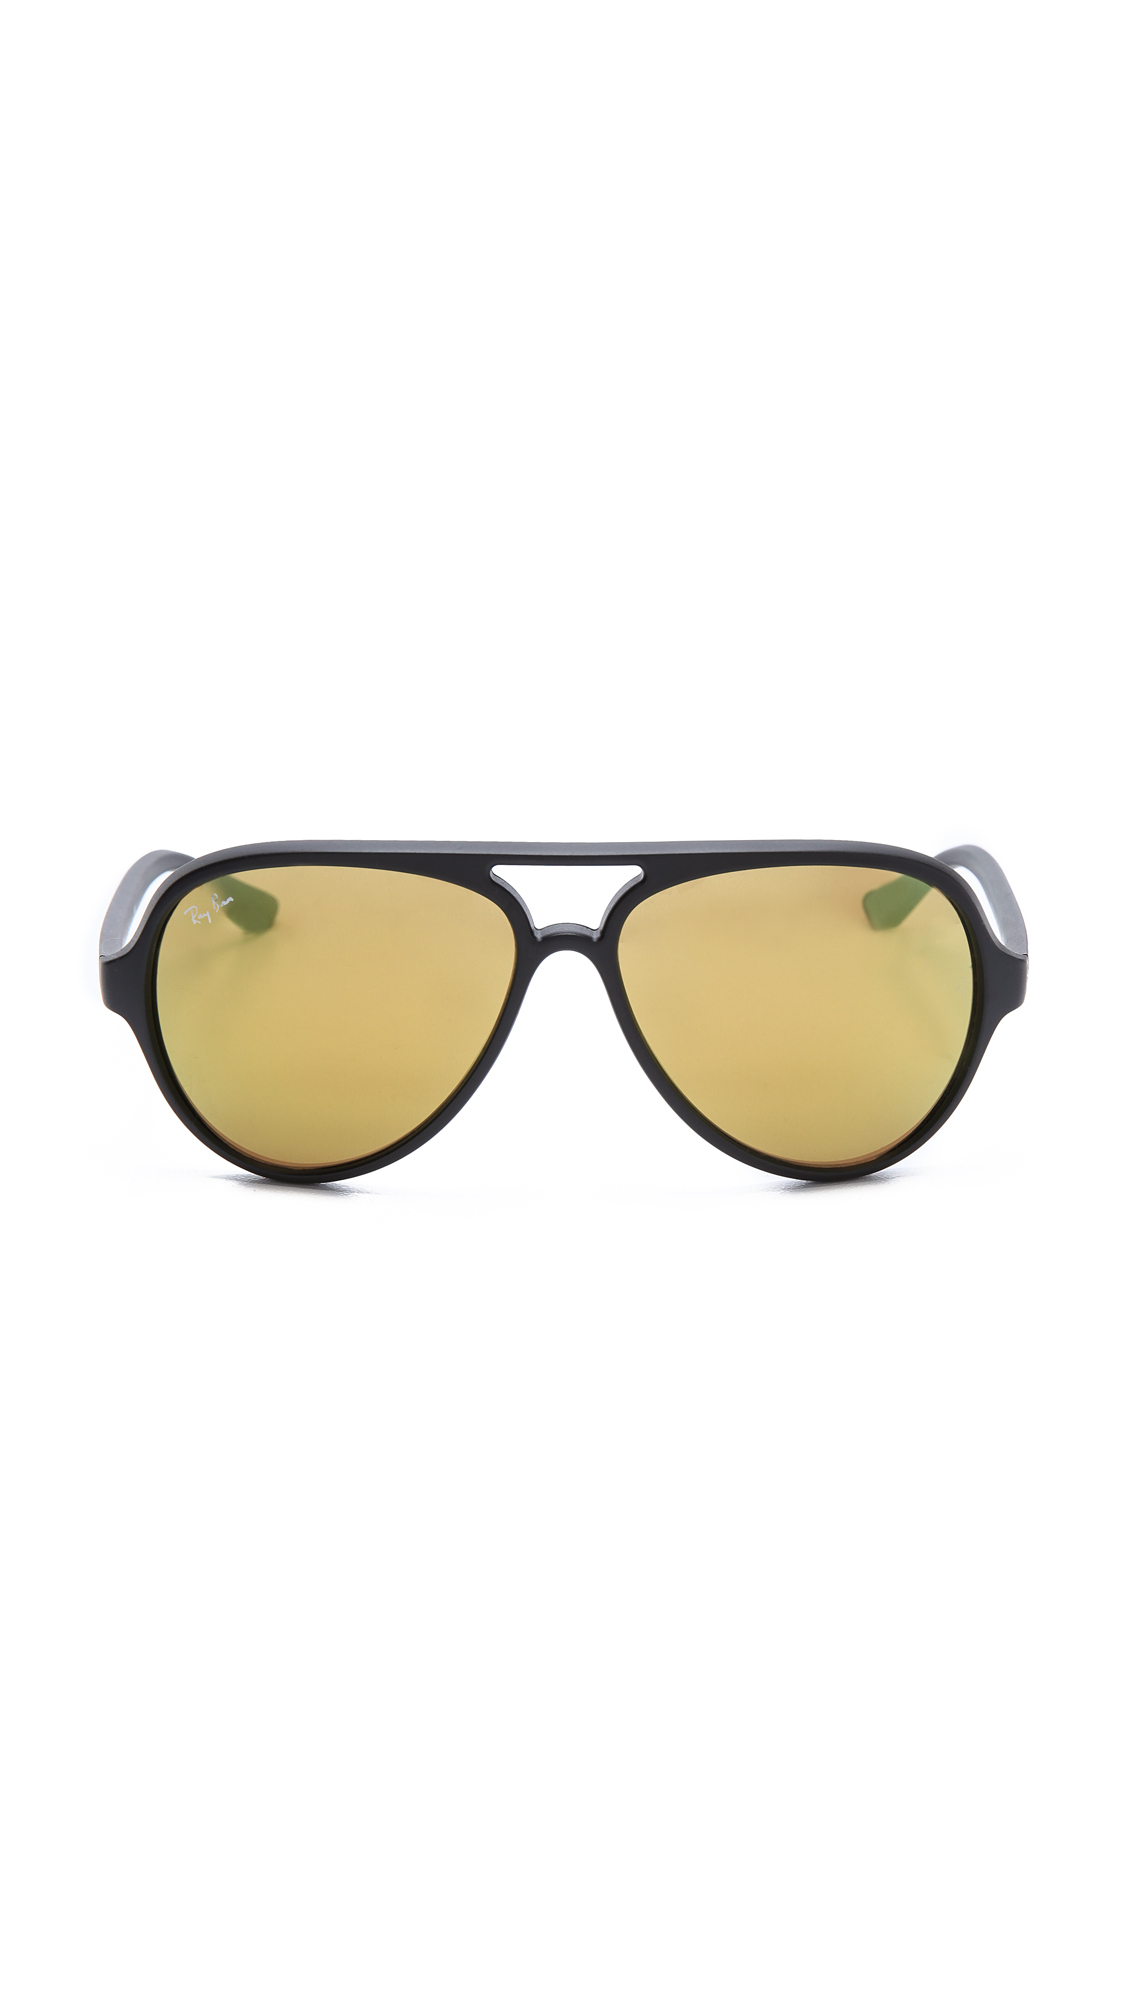 Ray-ban Matte Mirrored Cats 5000 Sunglasses - Black/Green Mirror